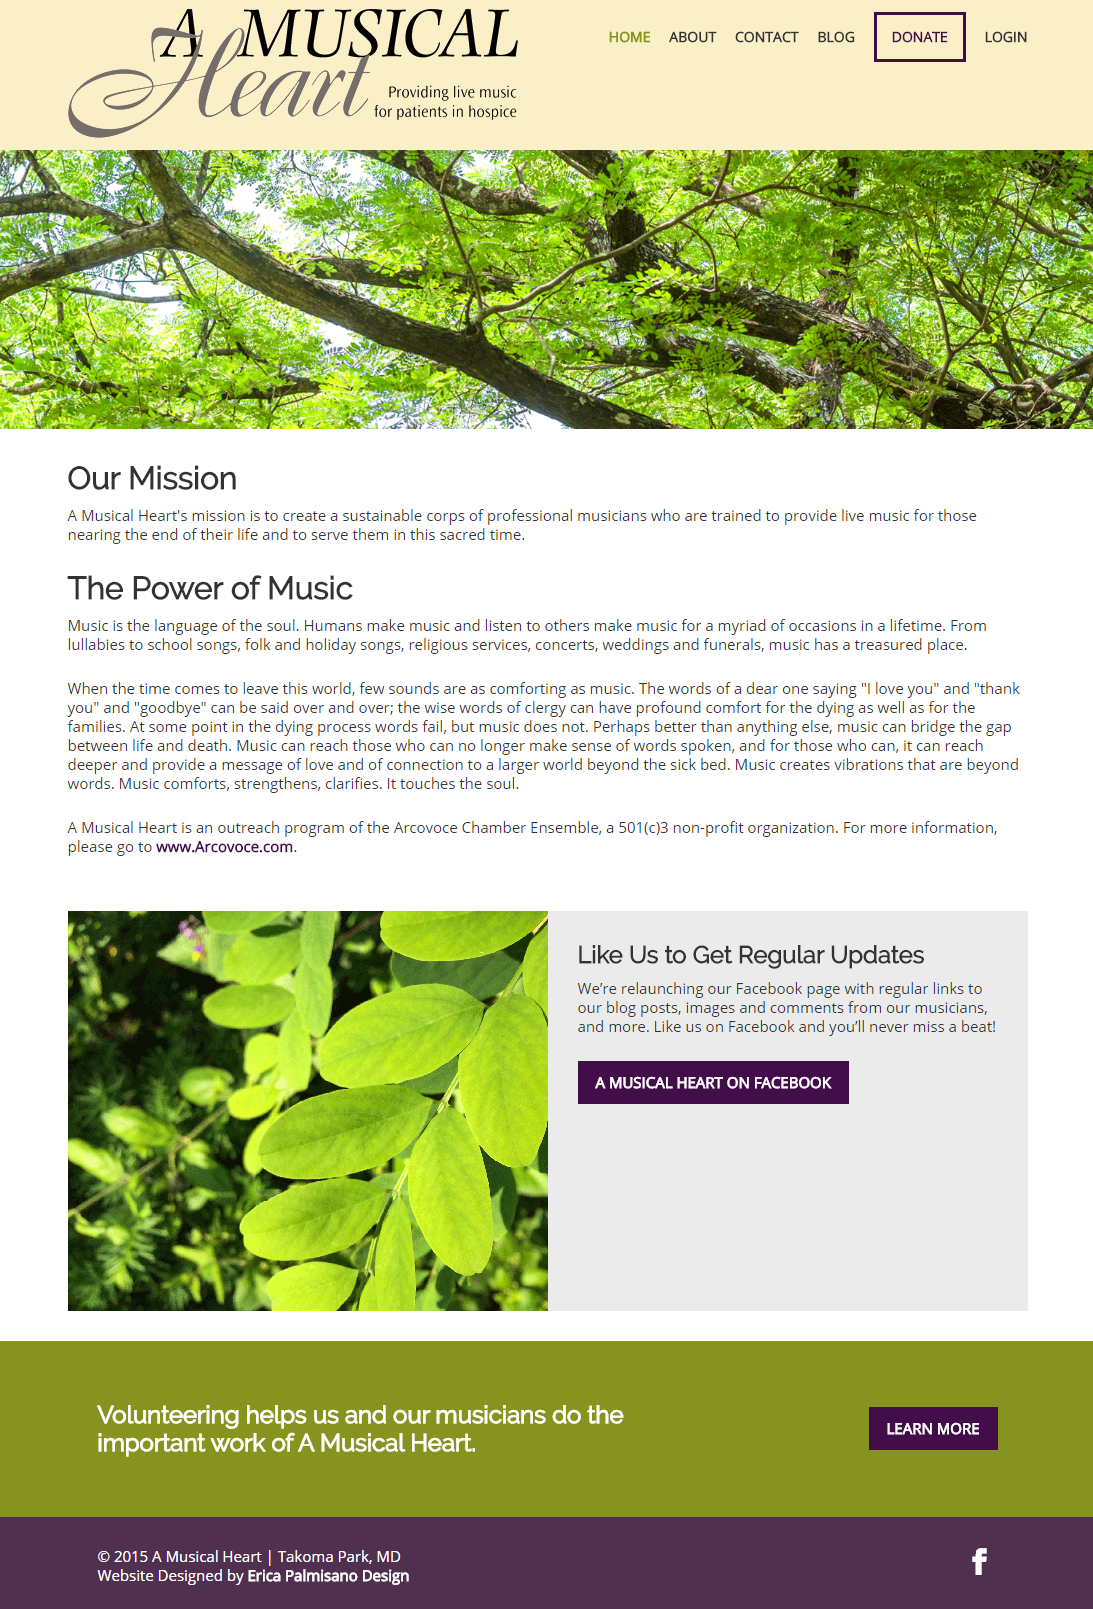 Nonprofit Website Redesign: A Musical Heart